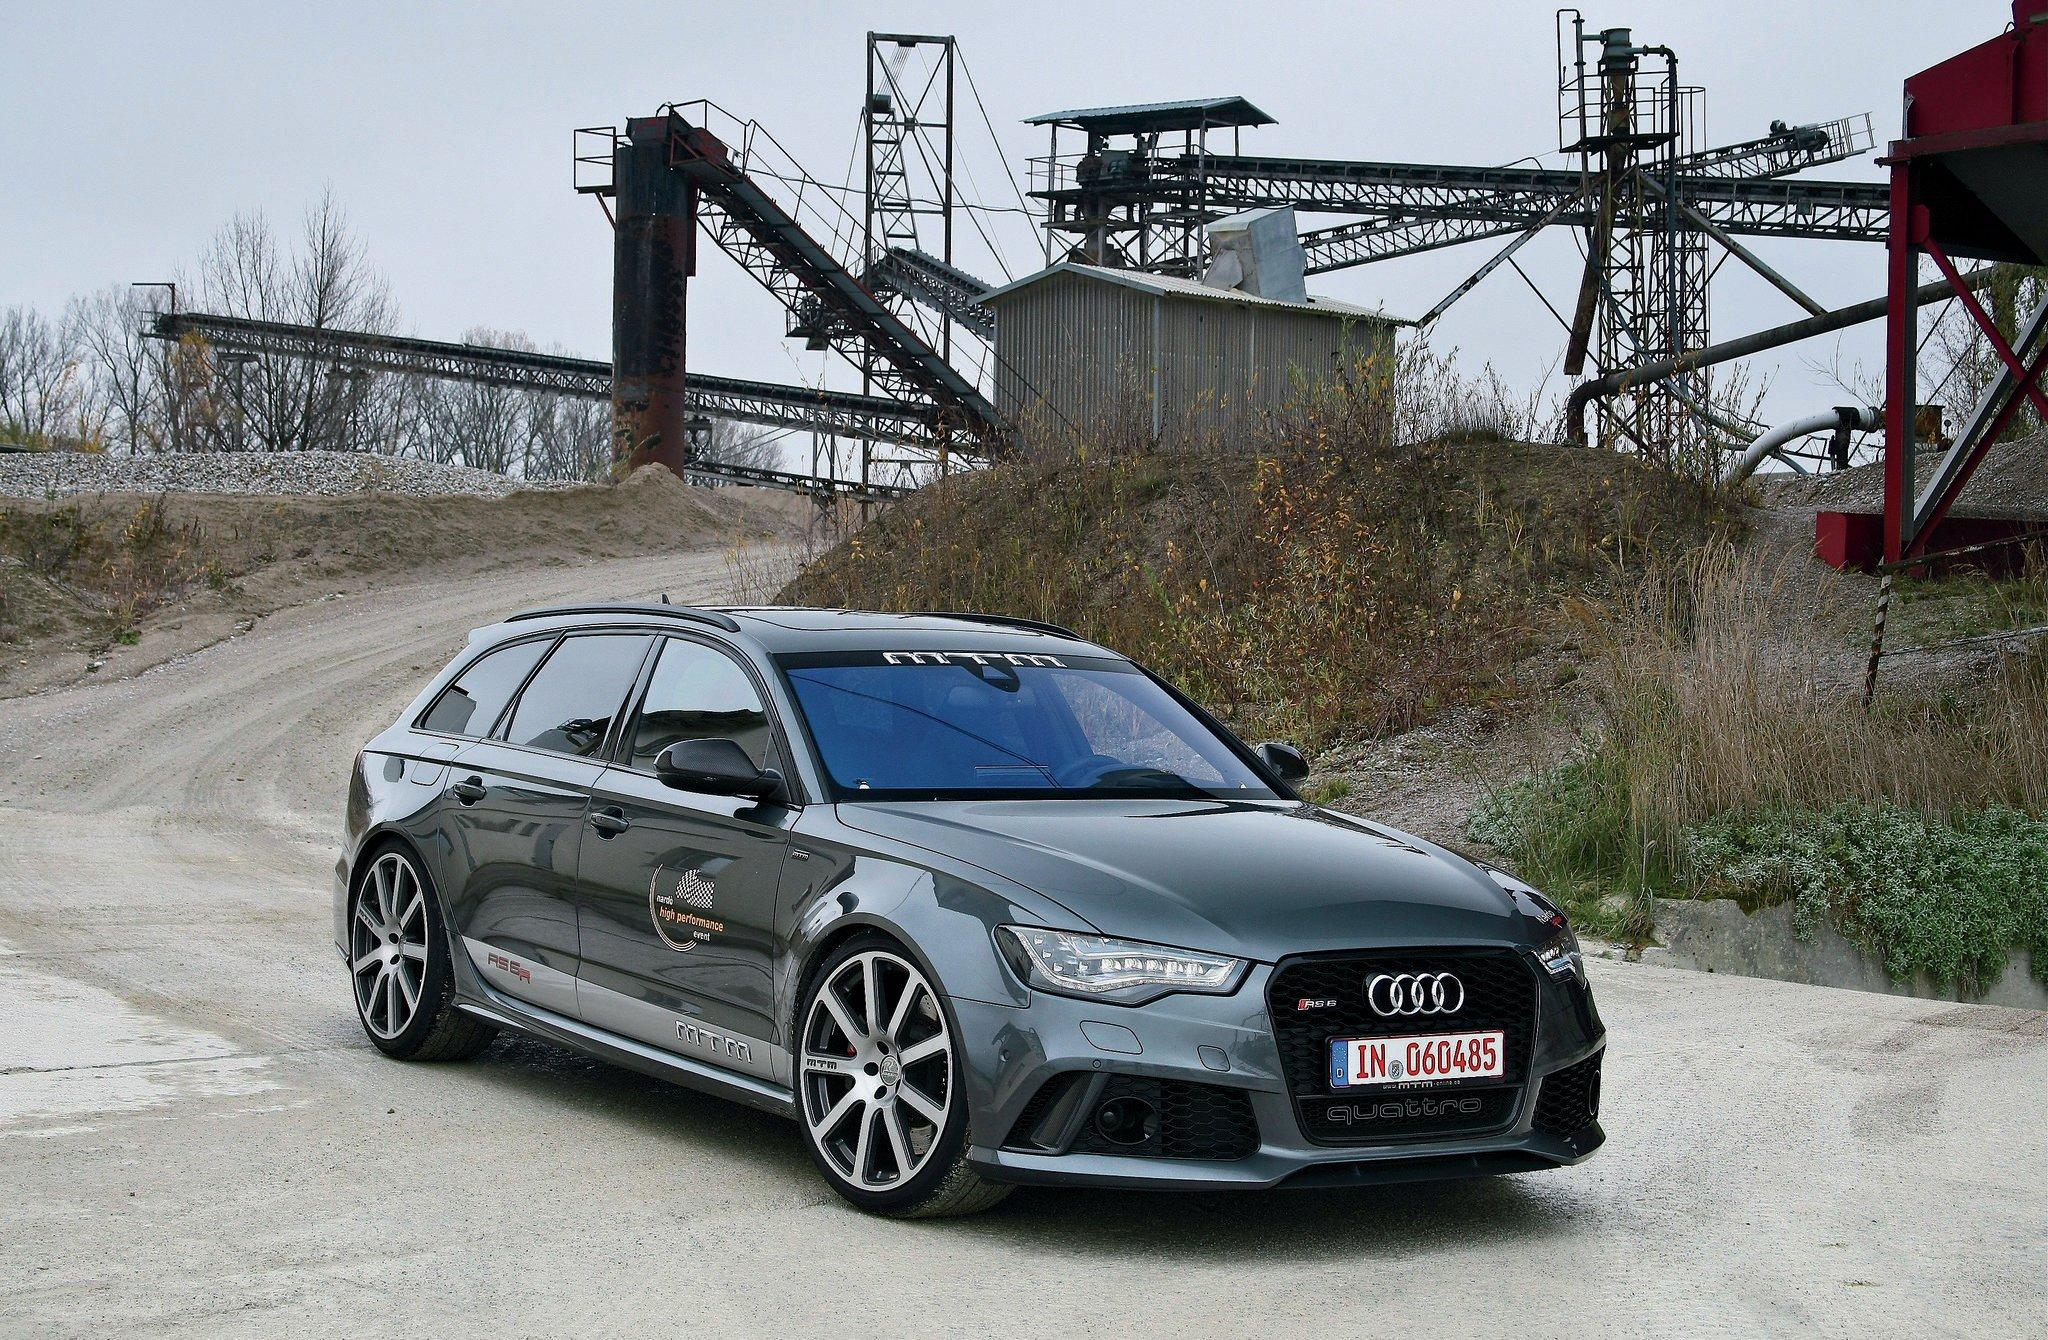 Mtm Builds A 700 Hp 211 Mph Audi Rs6 Wagon